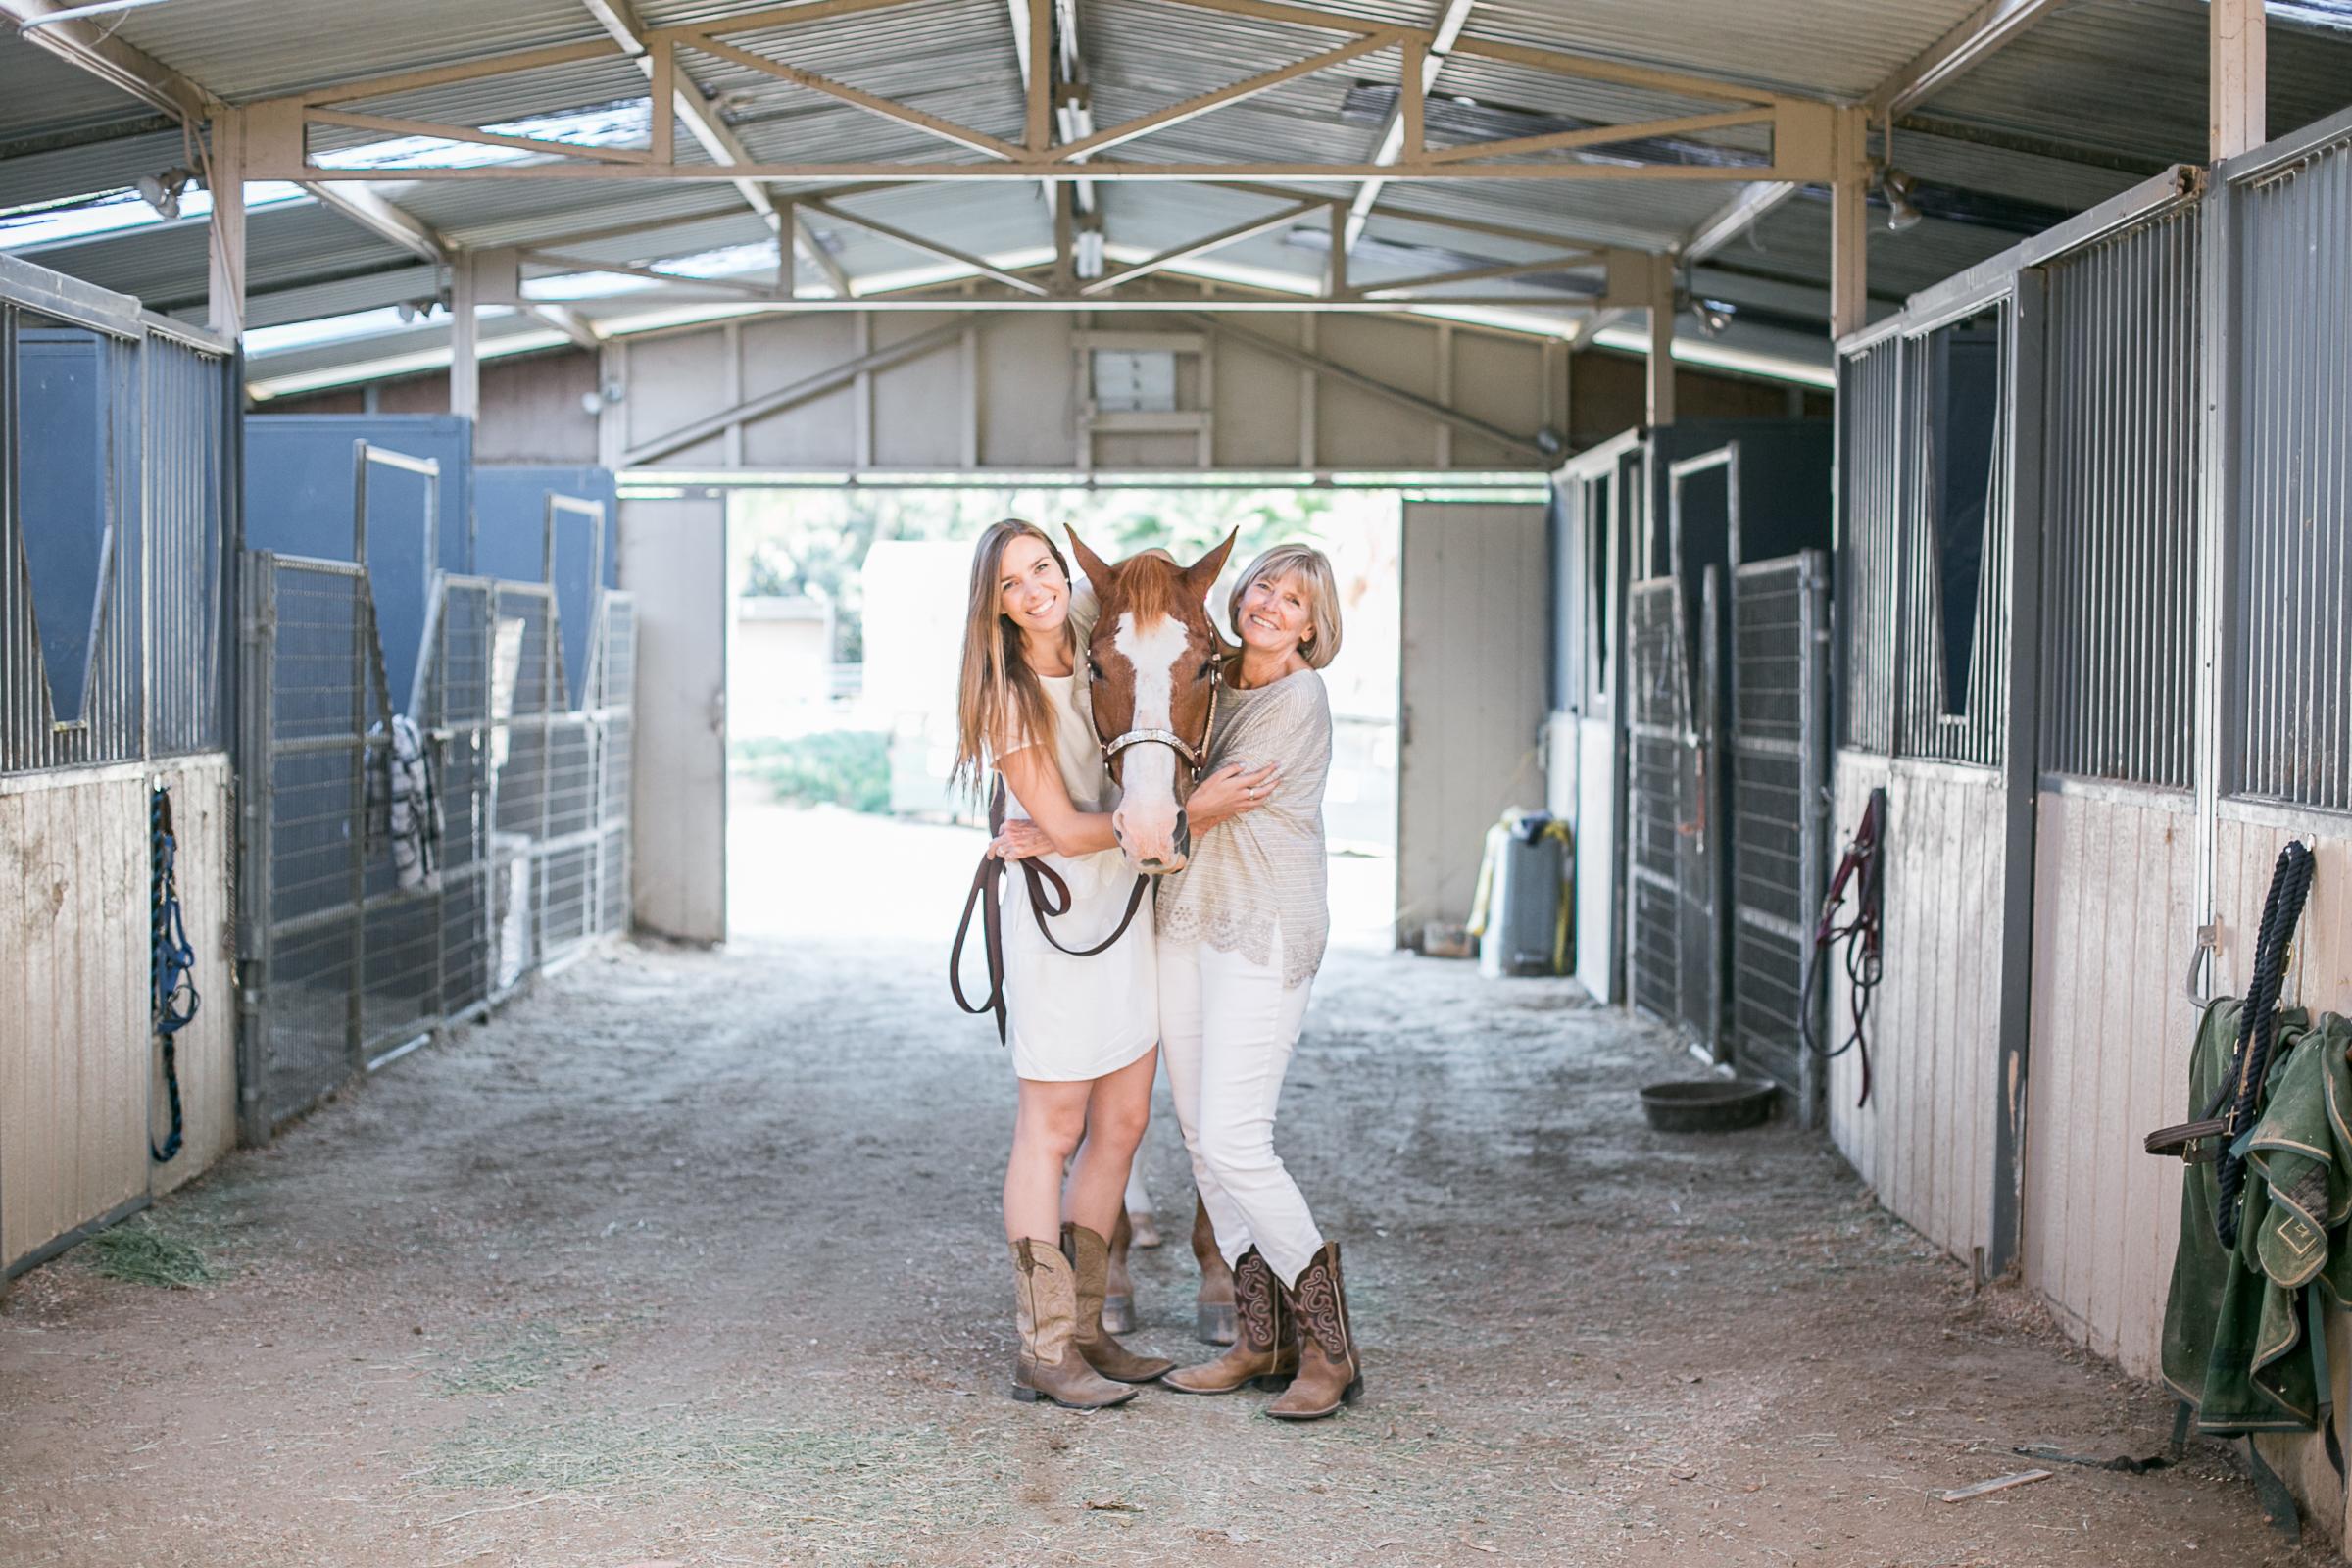 Mendola_Family _Session_Del_Mar_Equestrian_Ranch_2017-8.jpg